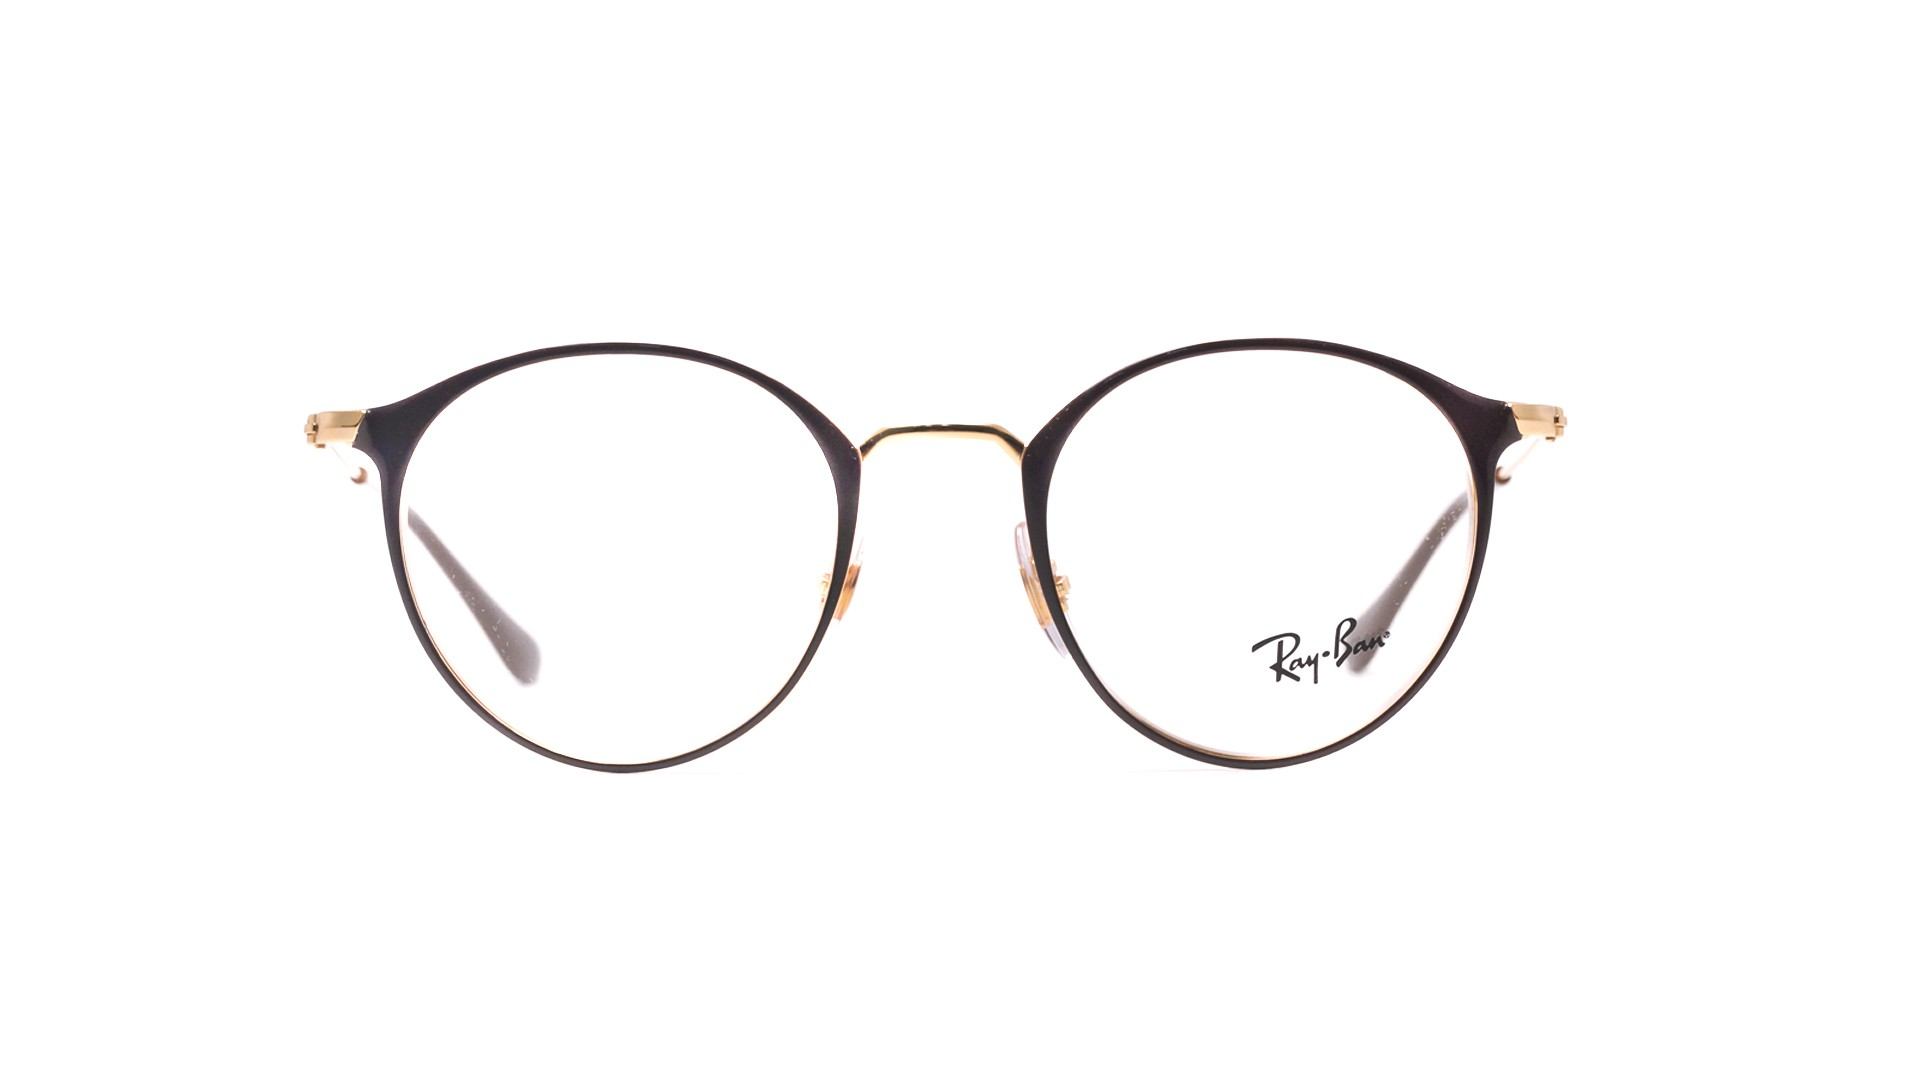 cb7899babb Eyeglasses Ray-Ban RX6378 RB6378 2905 47-21 Brown Small